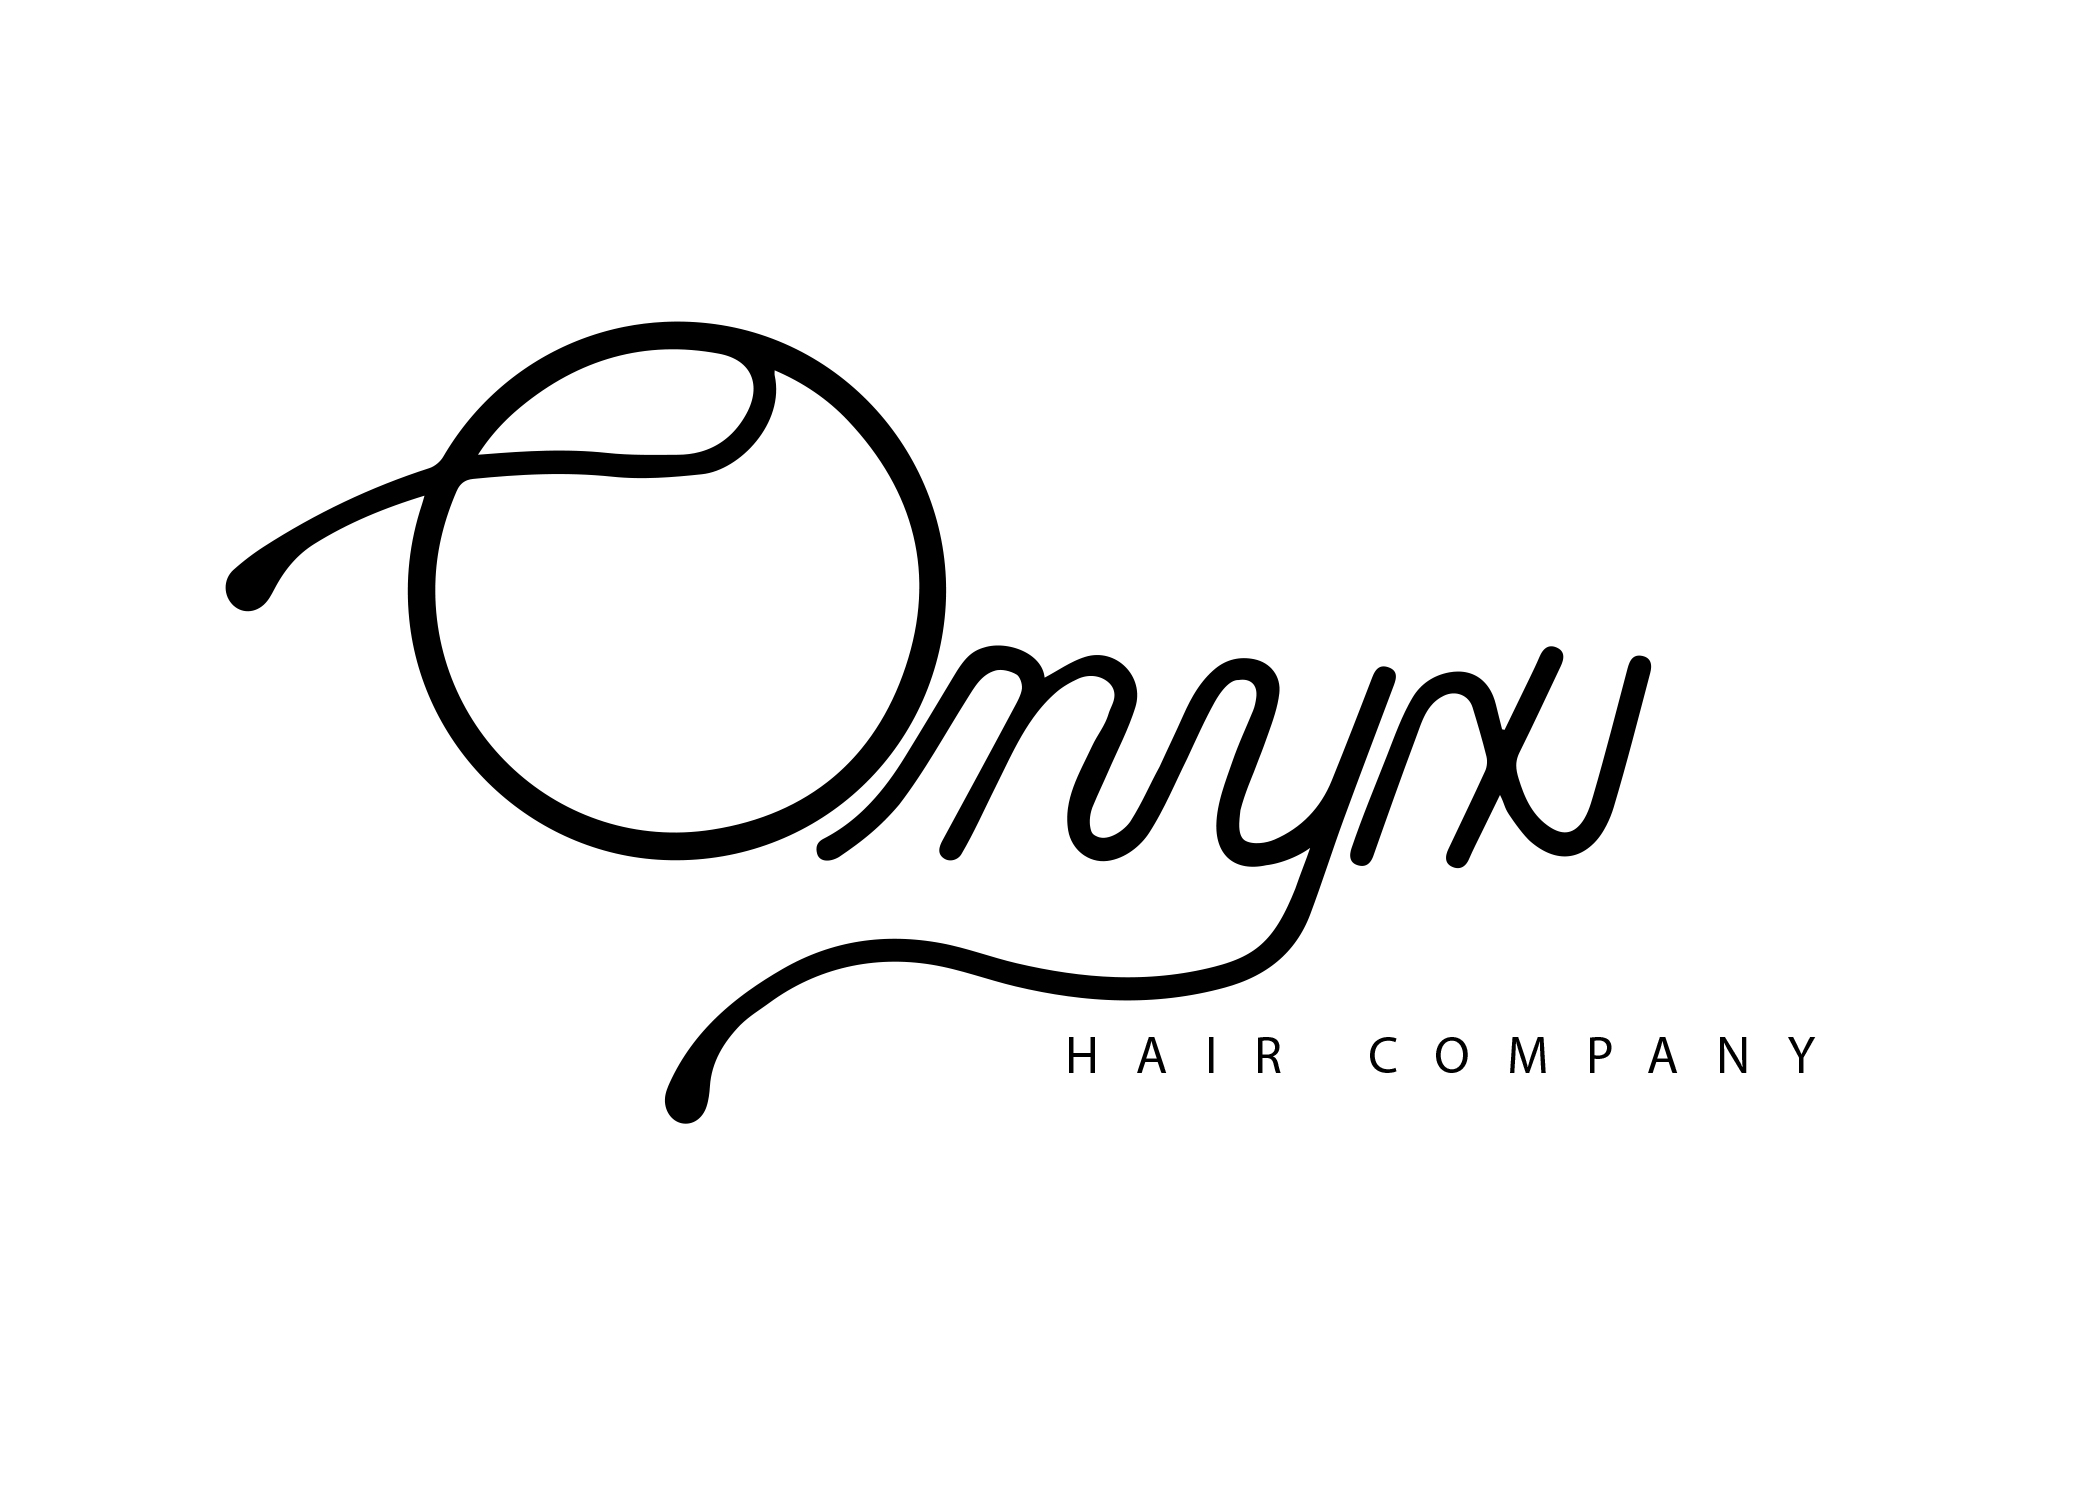 Onyx Hair